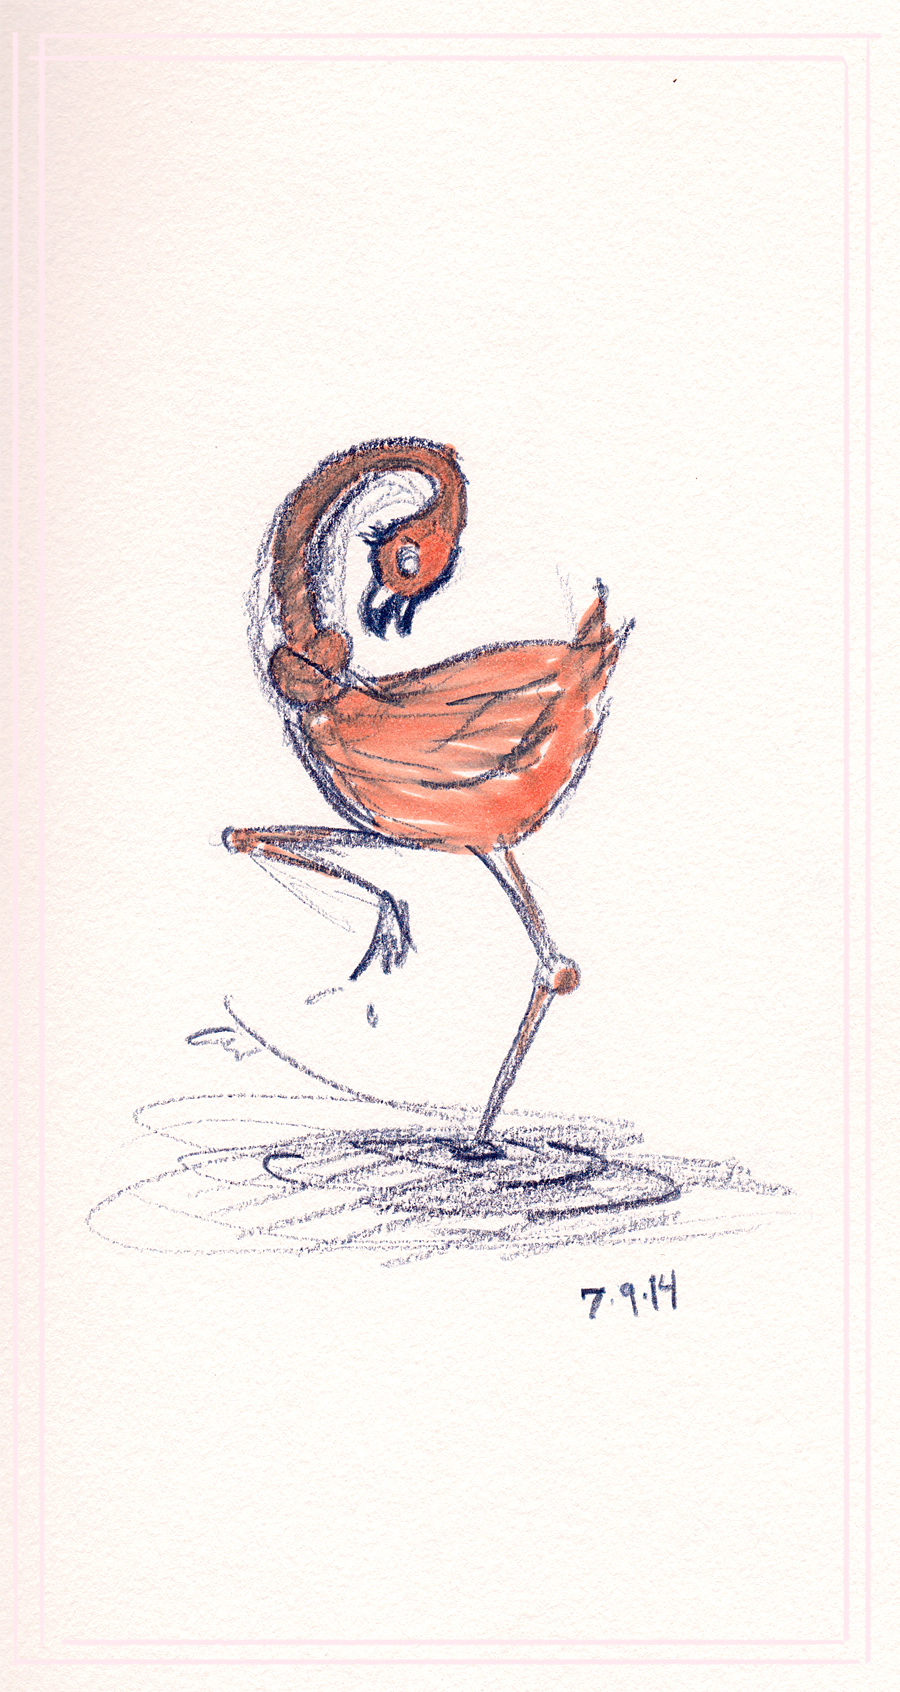 7_9_14_flamingo_web